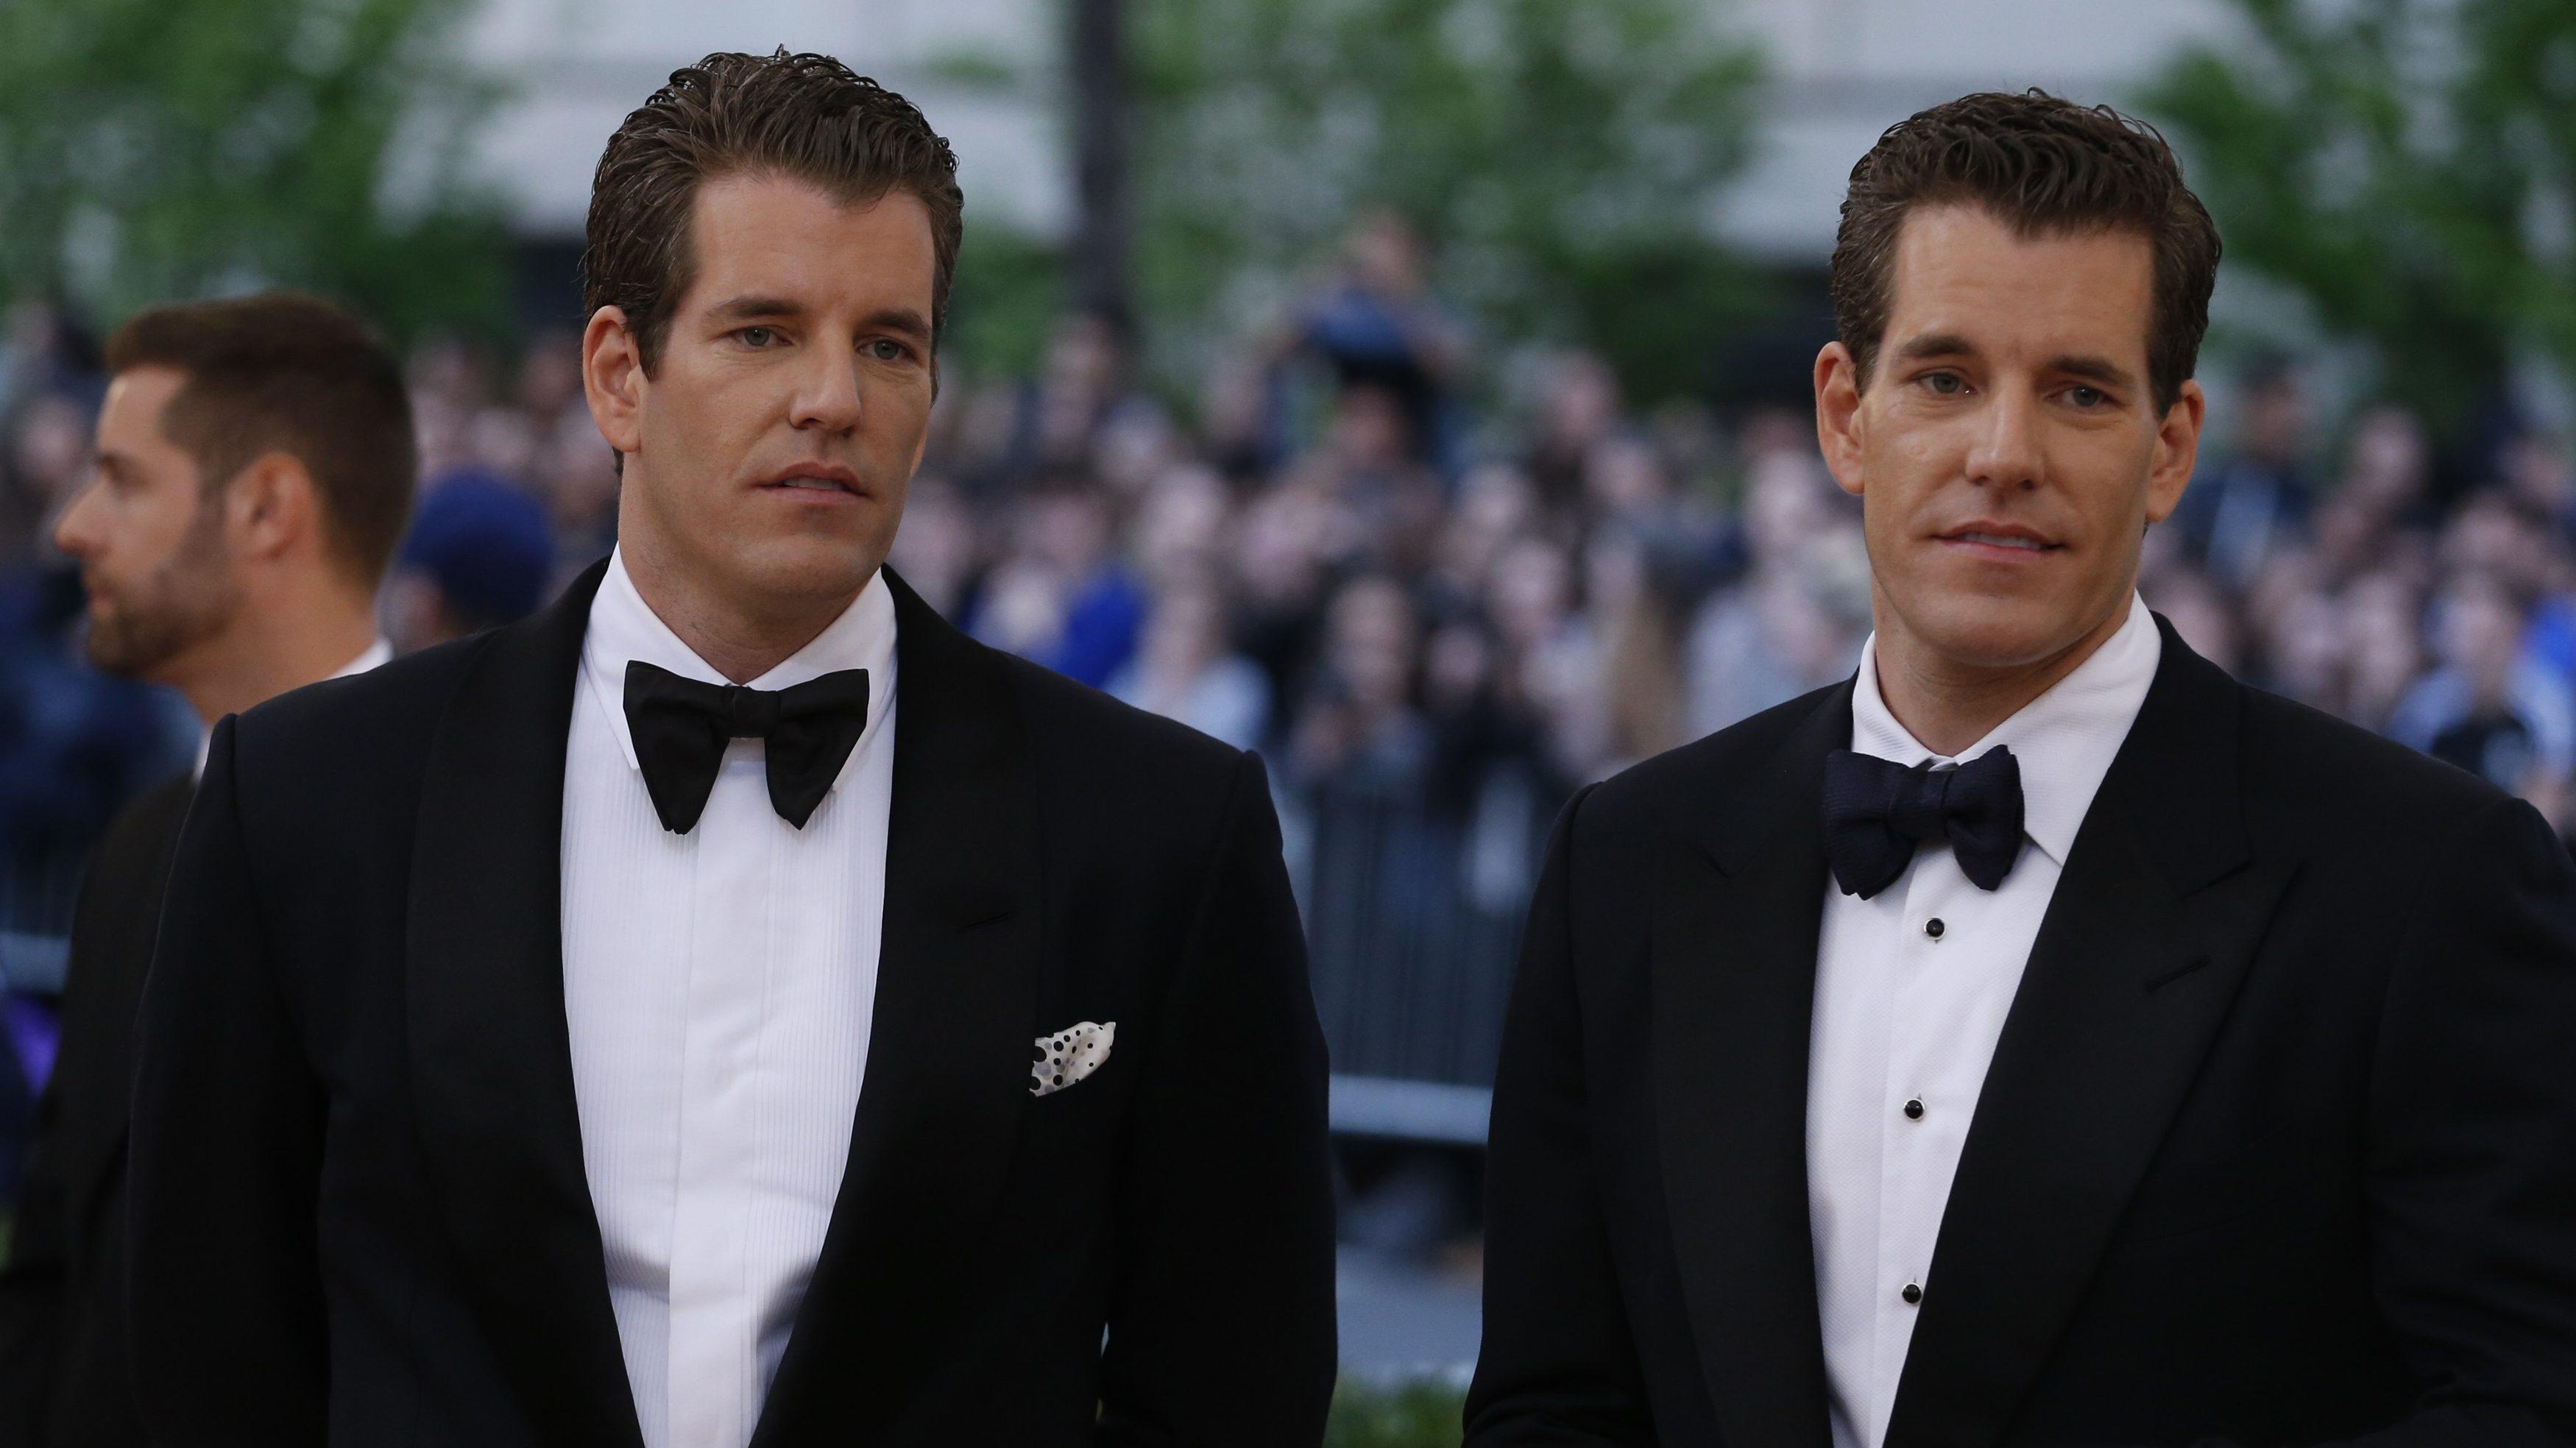 Entrepeneurs Tyler and Cameron Winklevoss arrive at the Met Gala in New York